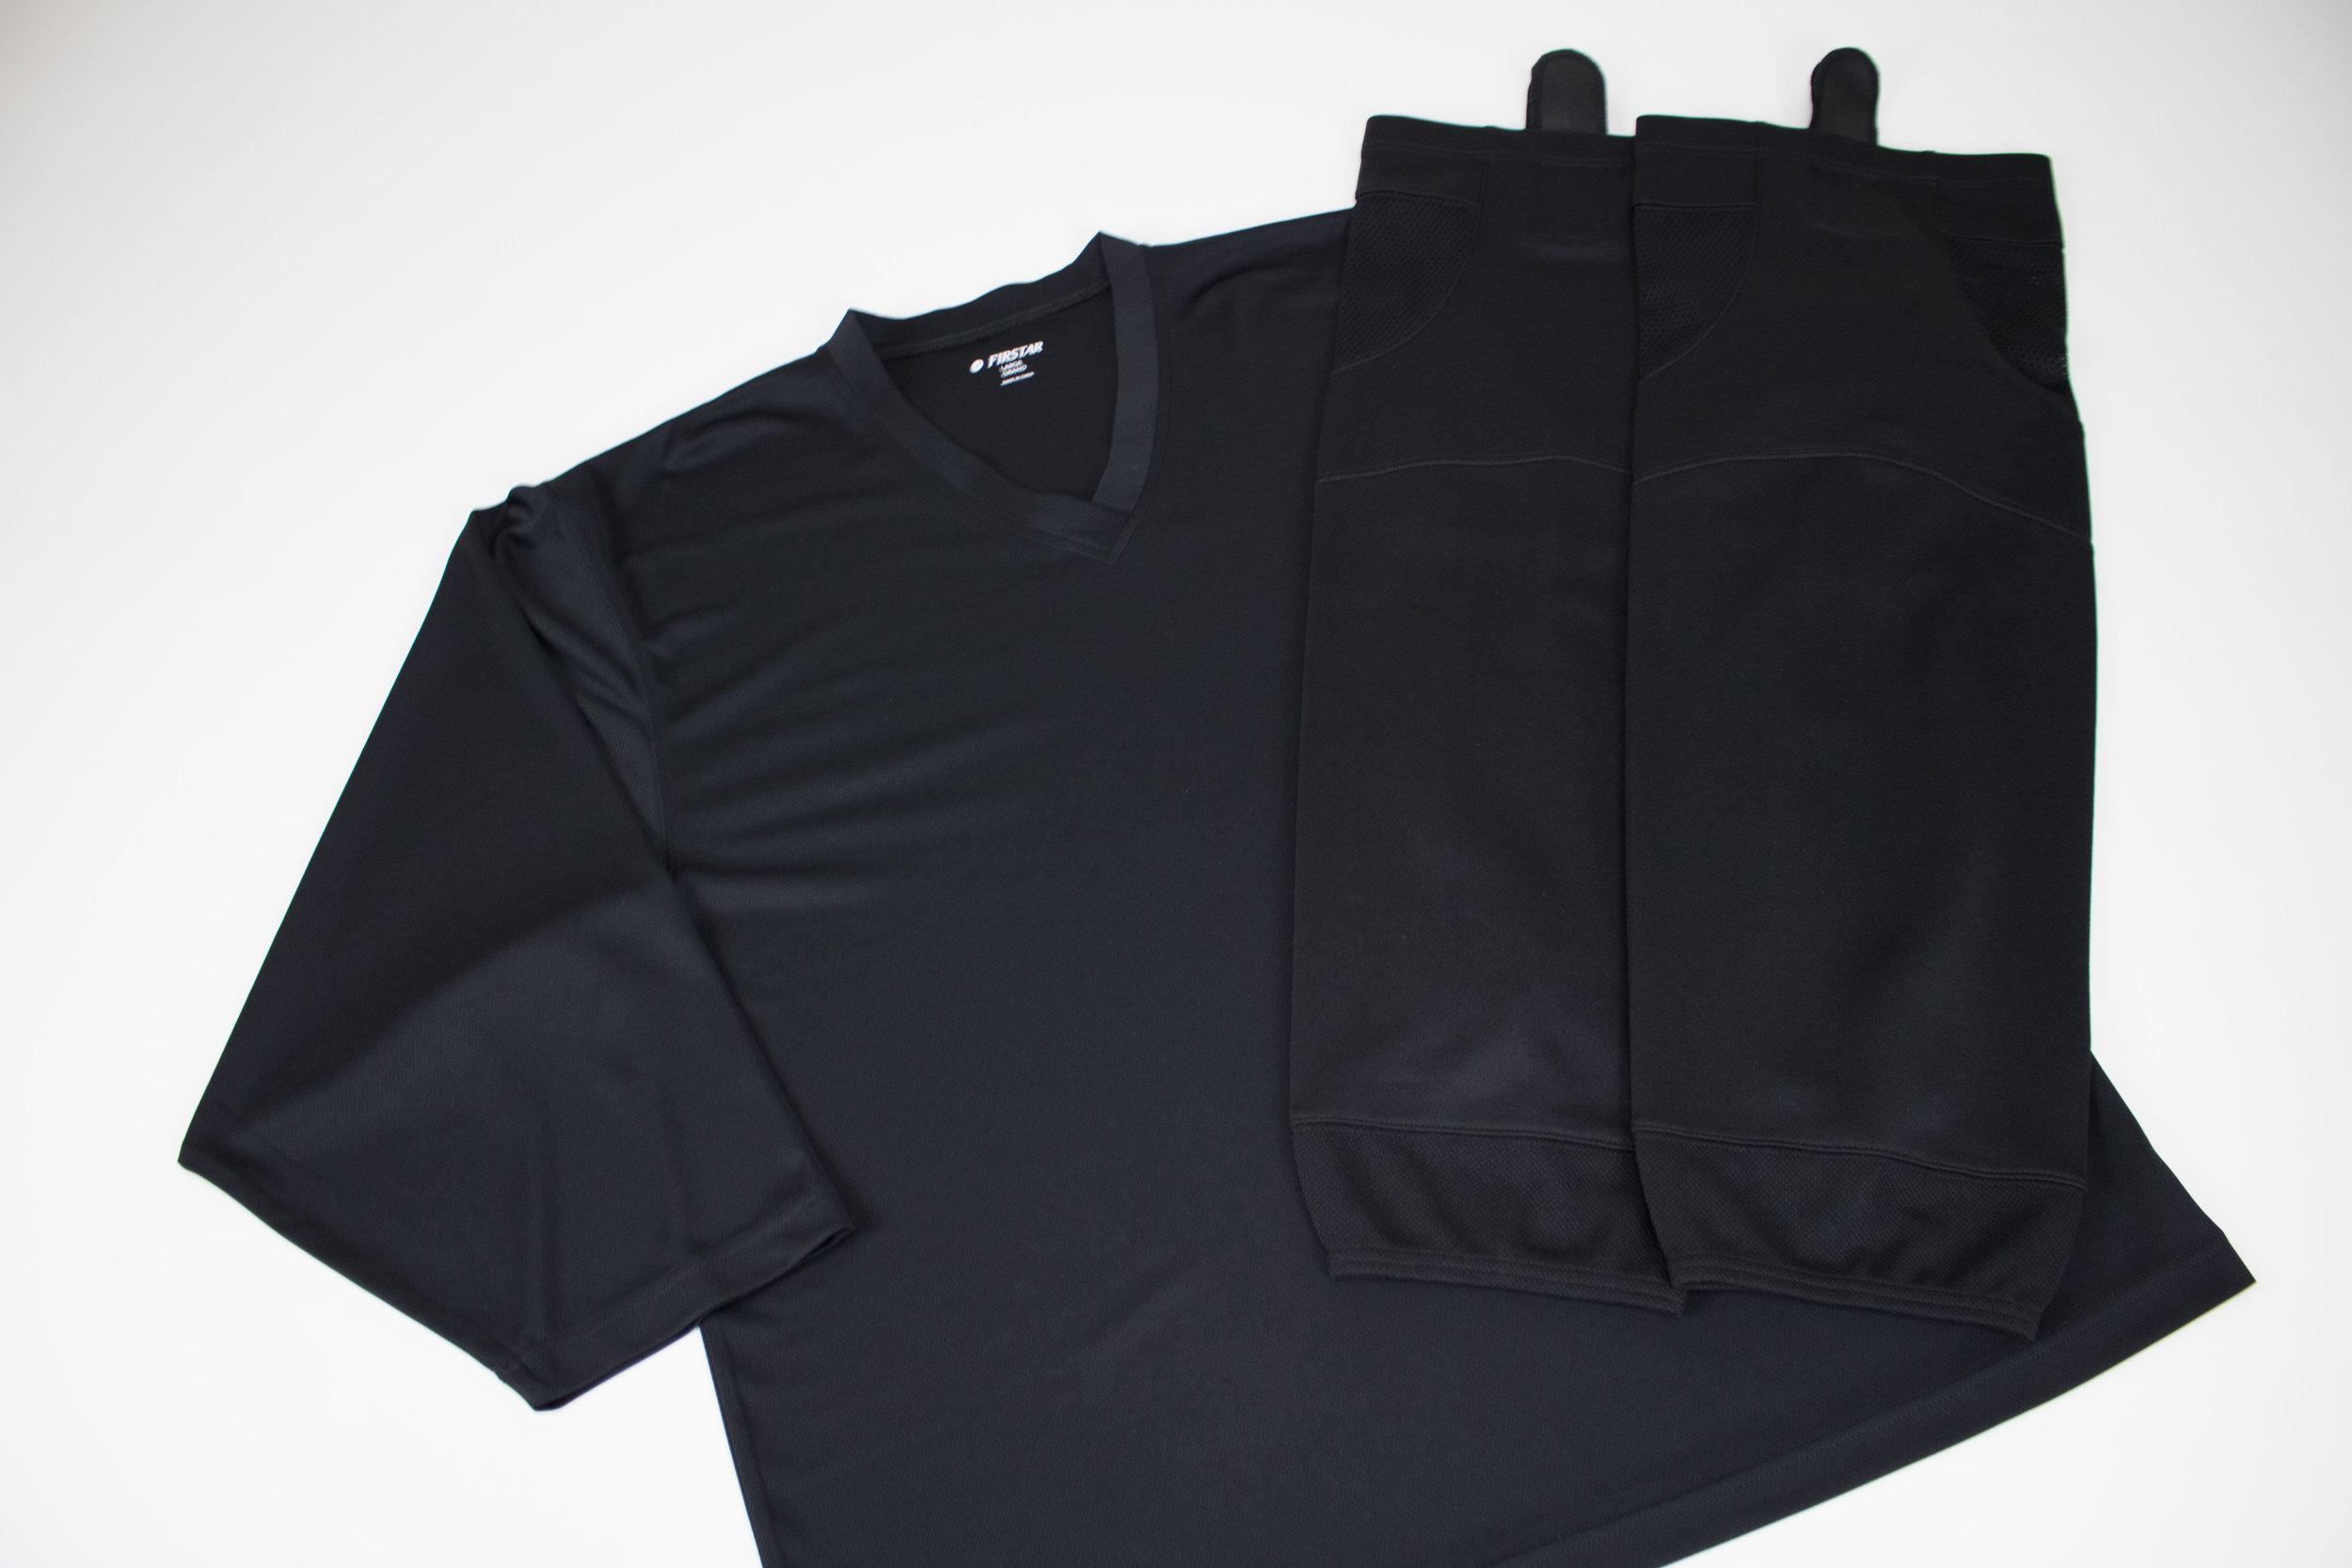 Rink Jerseys & Socks - Lightweight and Durable Jerseys and Socks